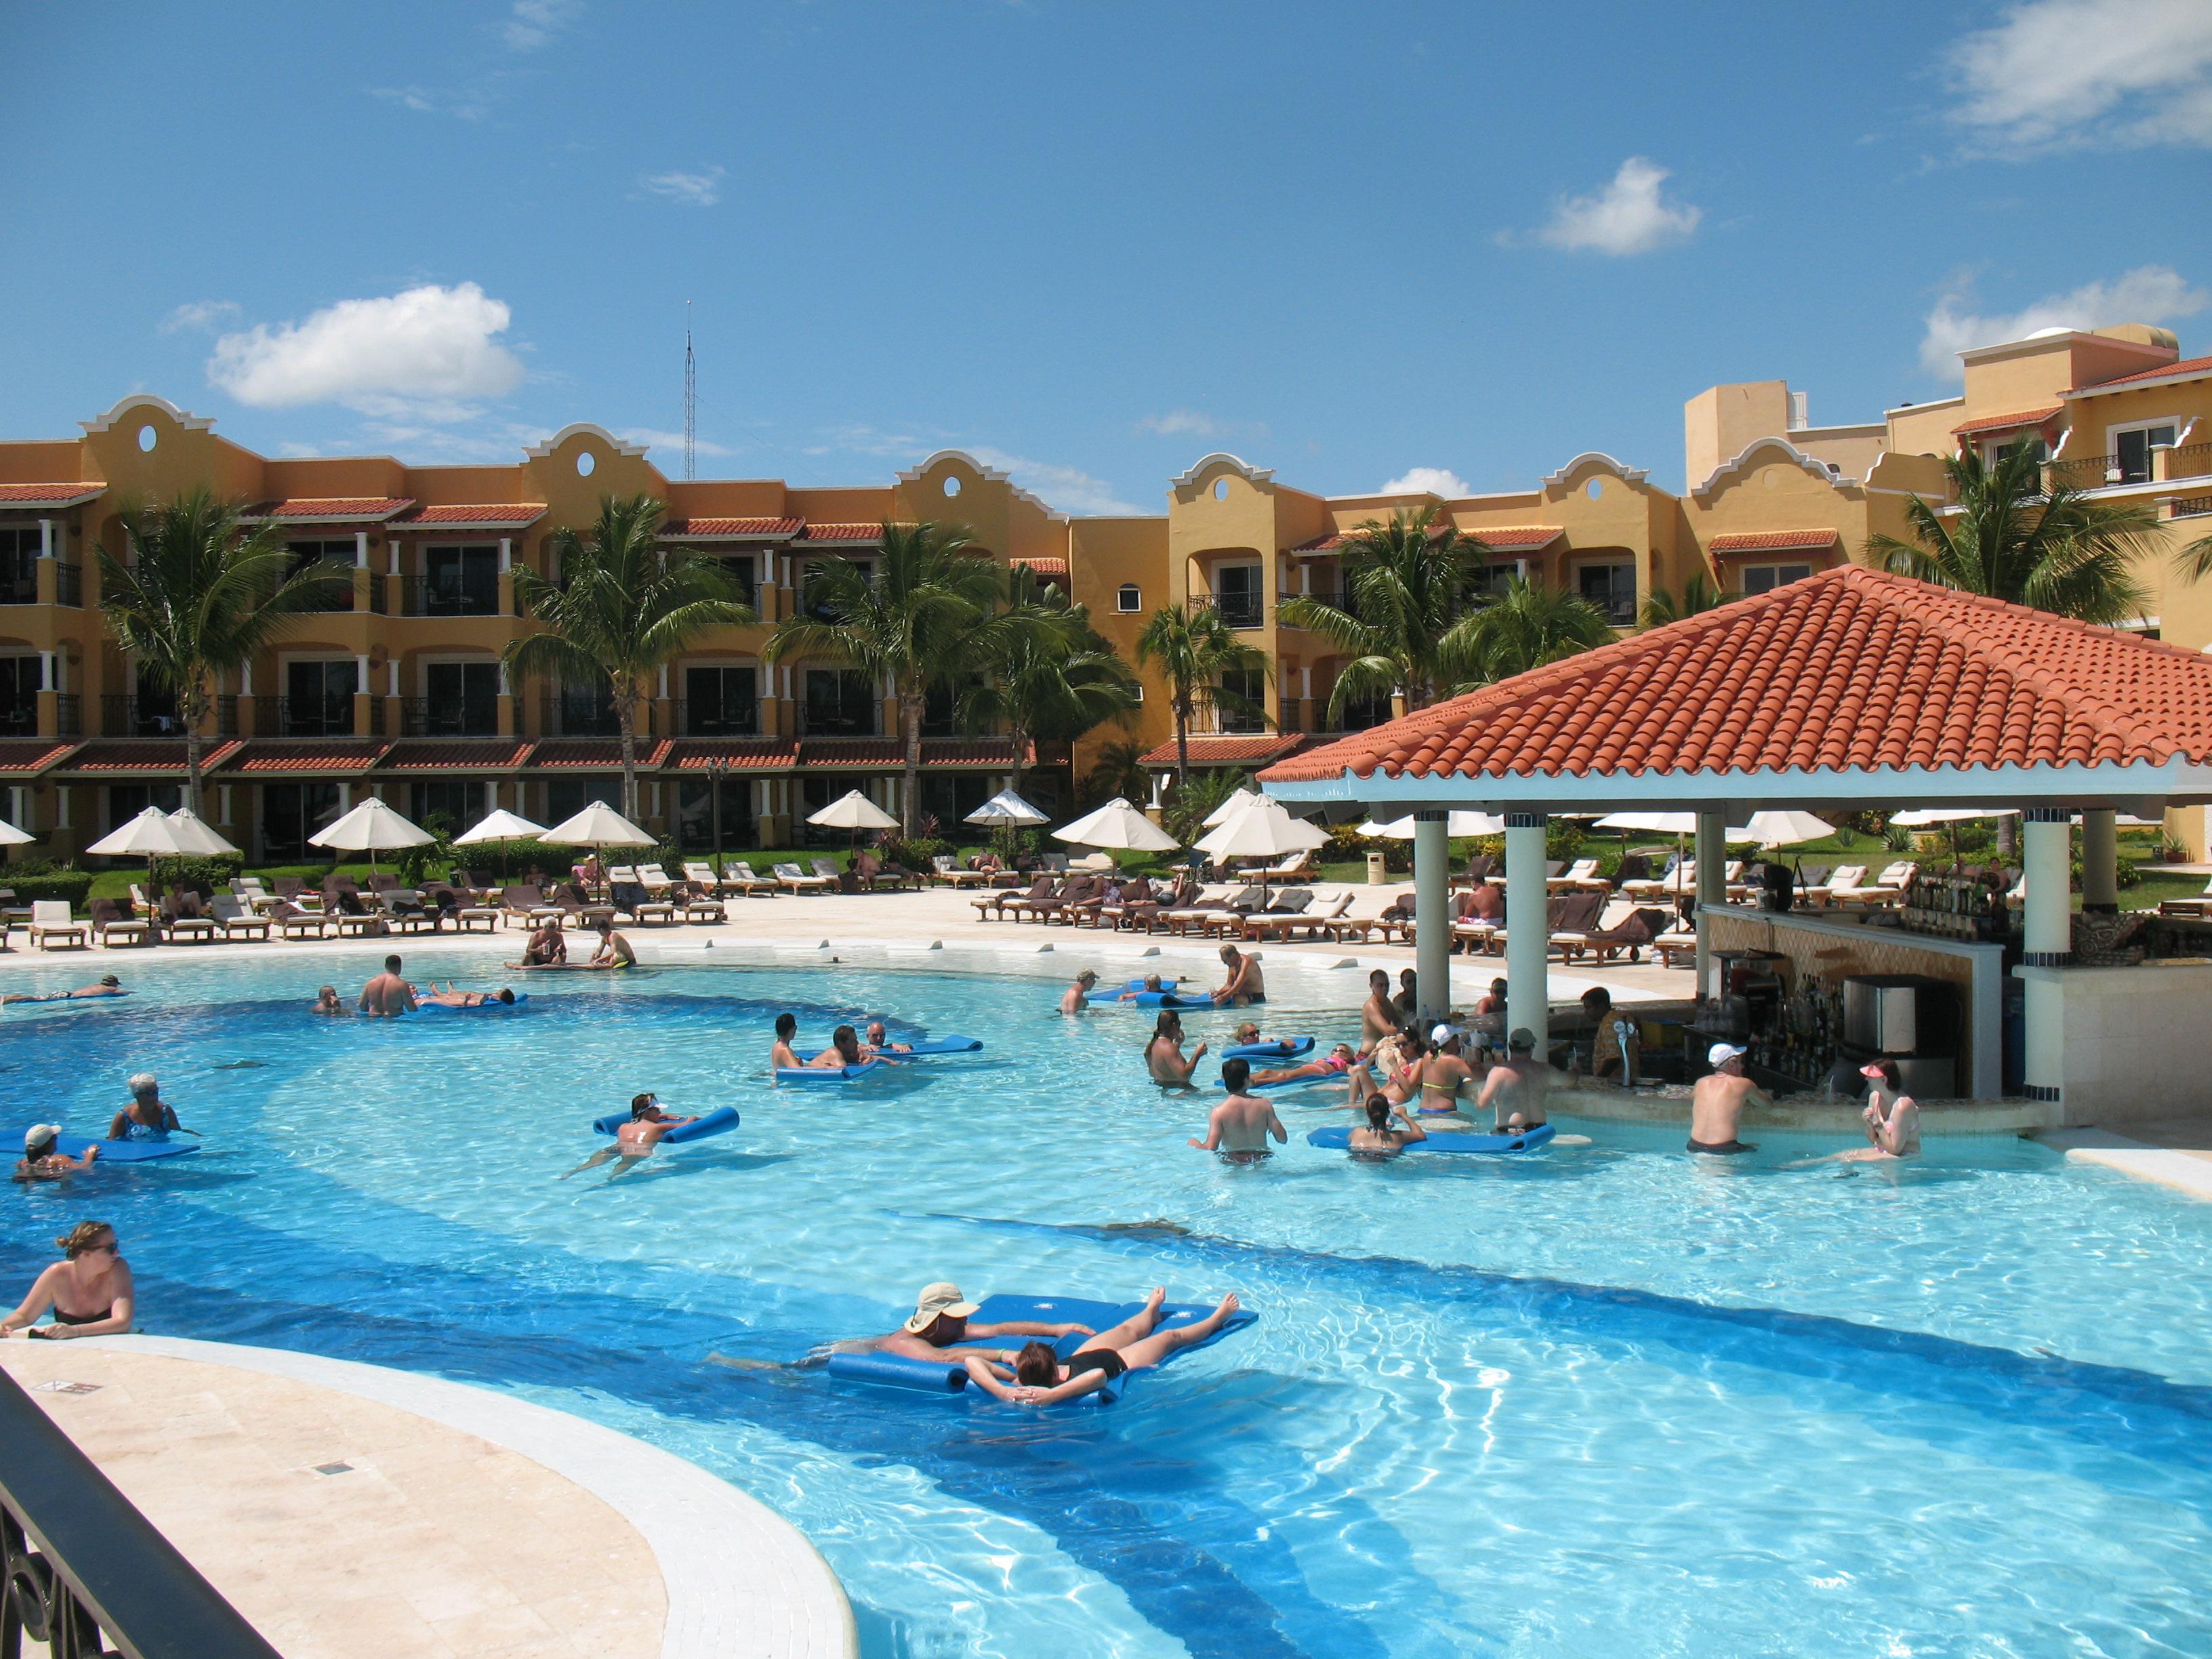 eztravelpad: secrets capri resort along riviera maya in mexico - a